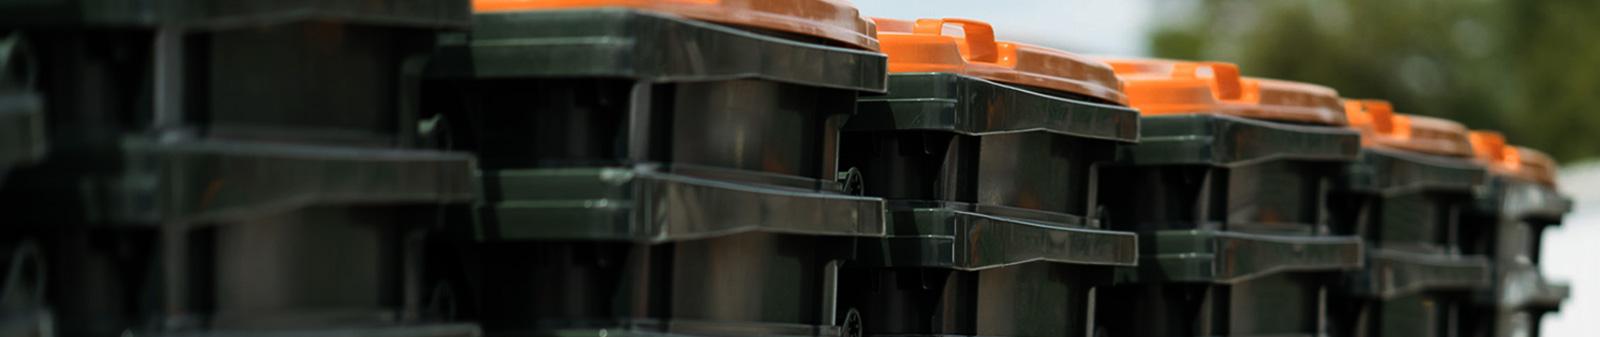 SUEZ waste streams plastic external push